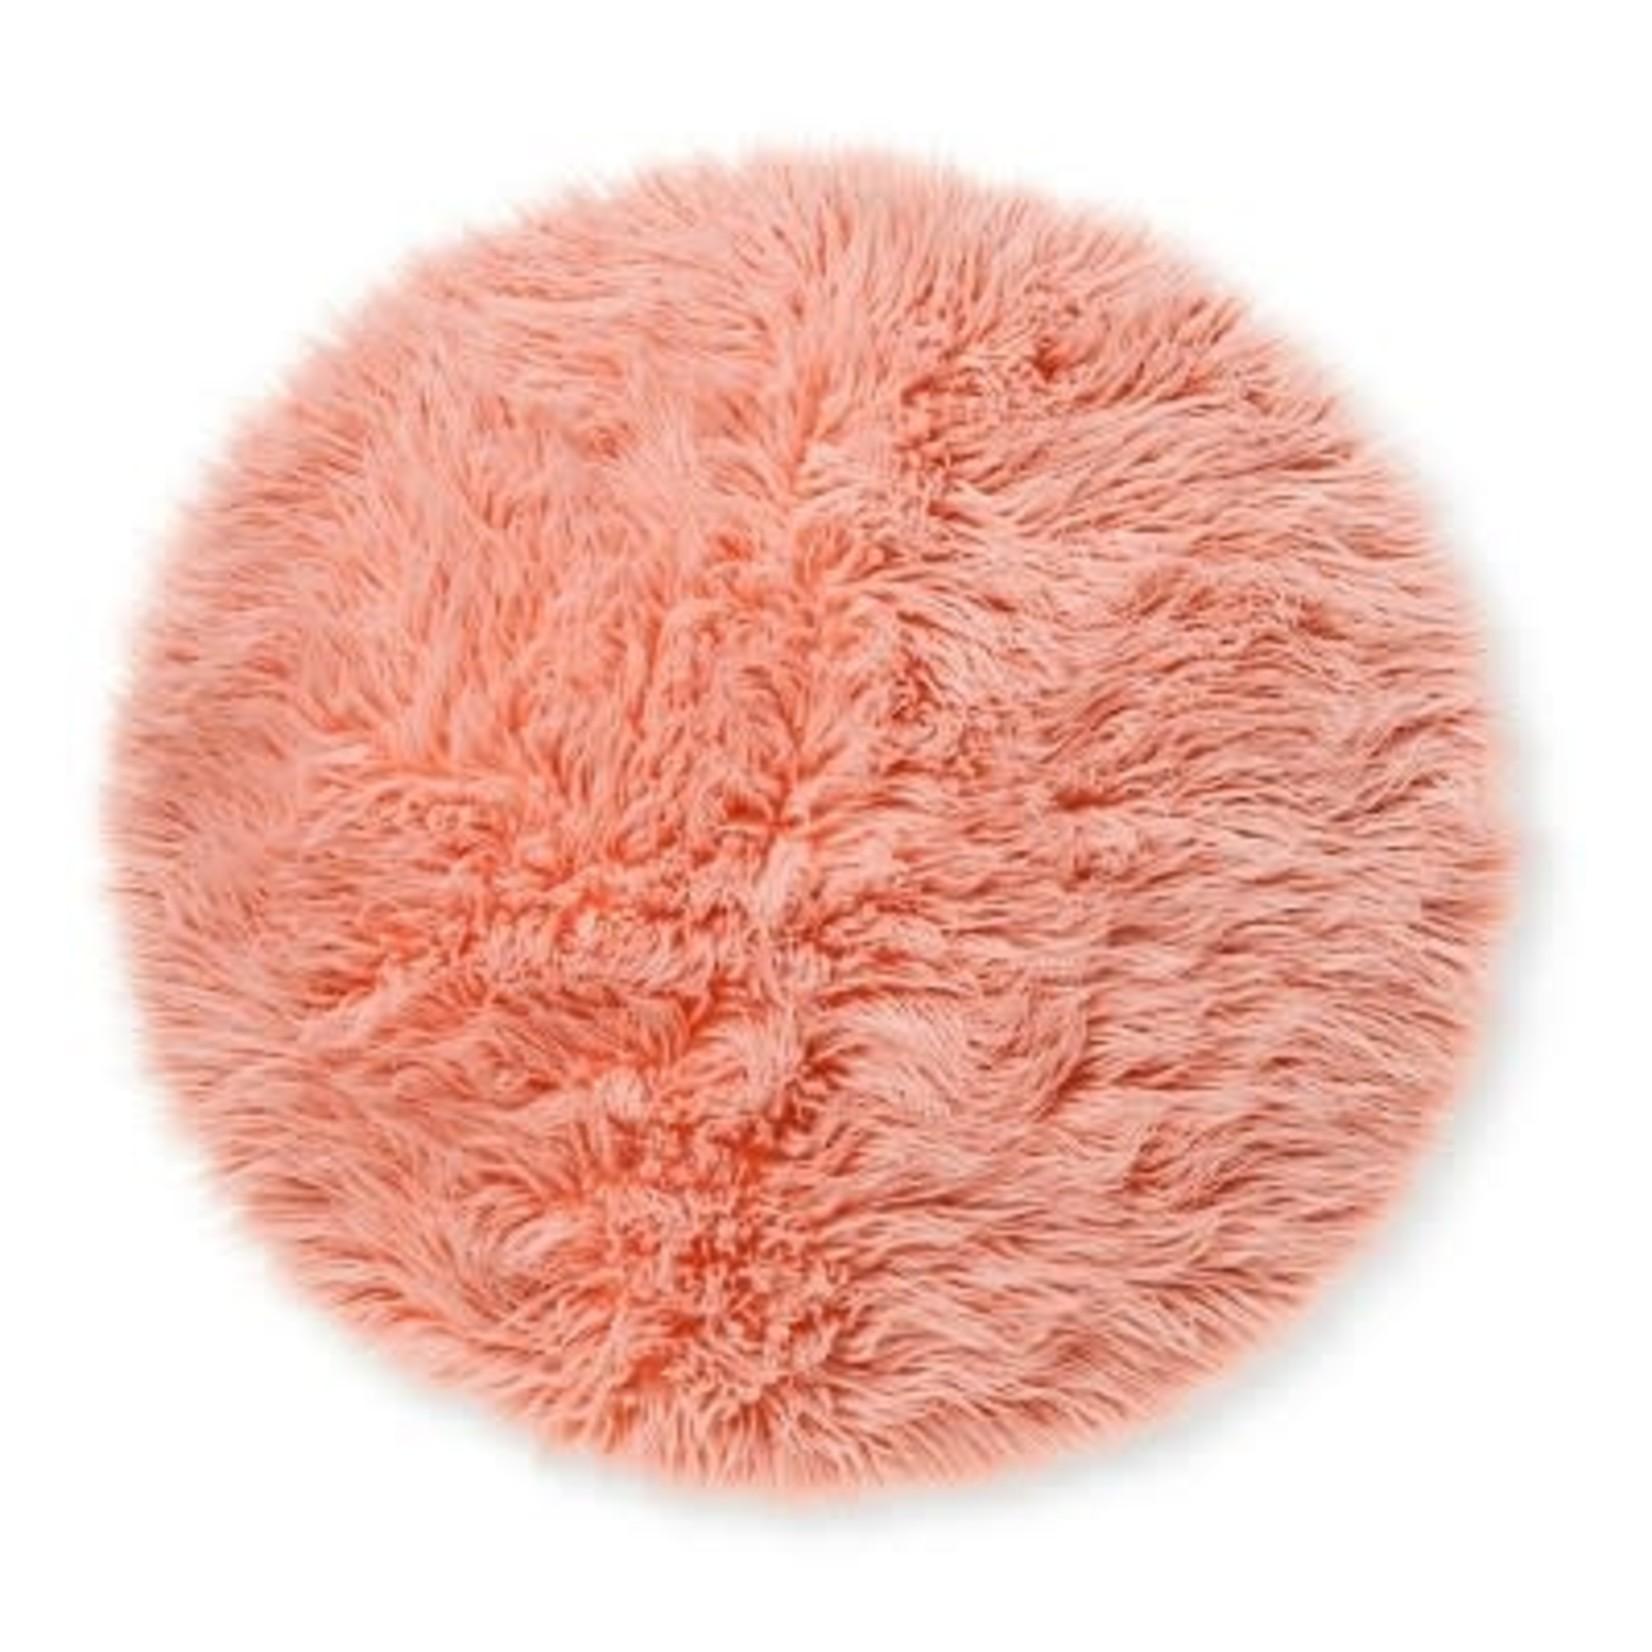 3' Faux Fur Rug Round Pink - Pillowfort™